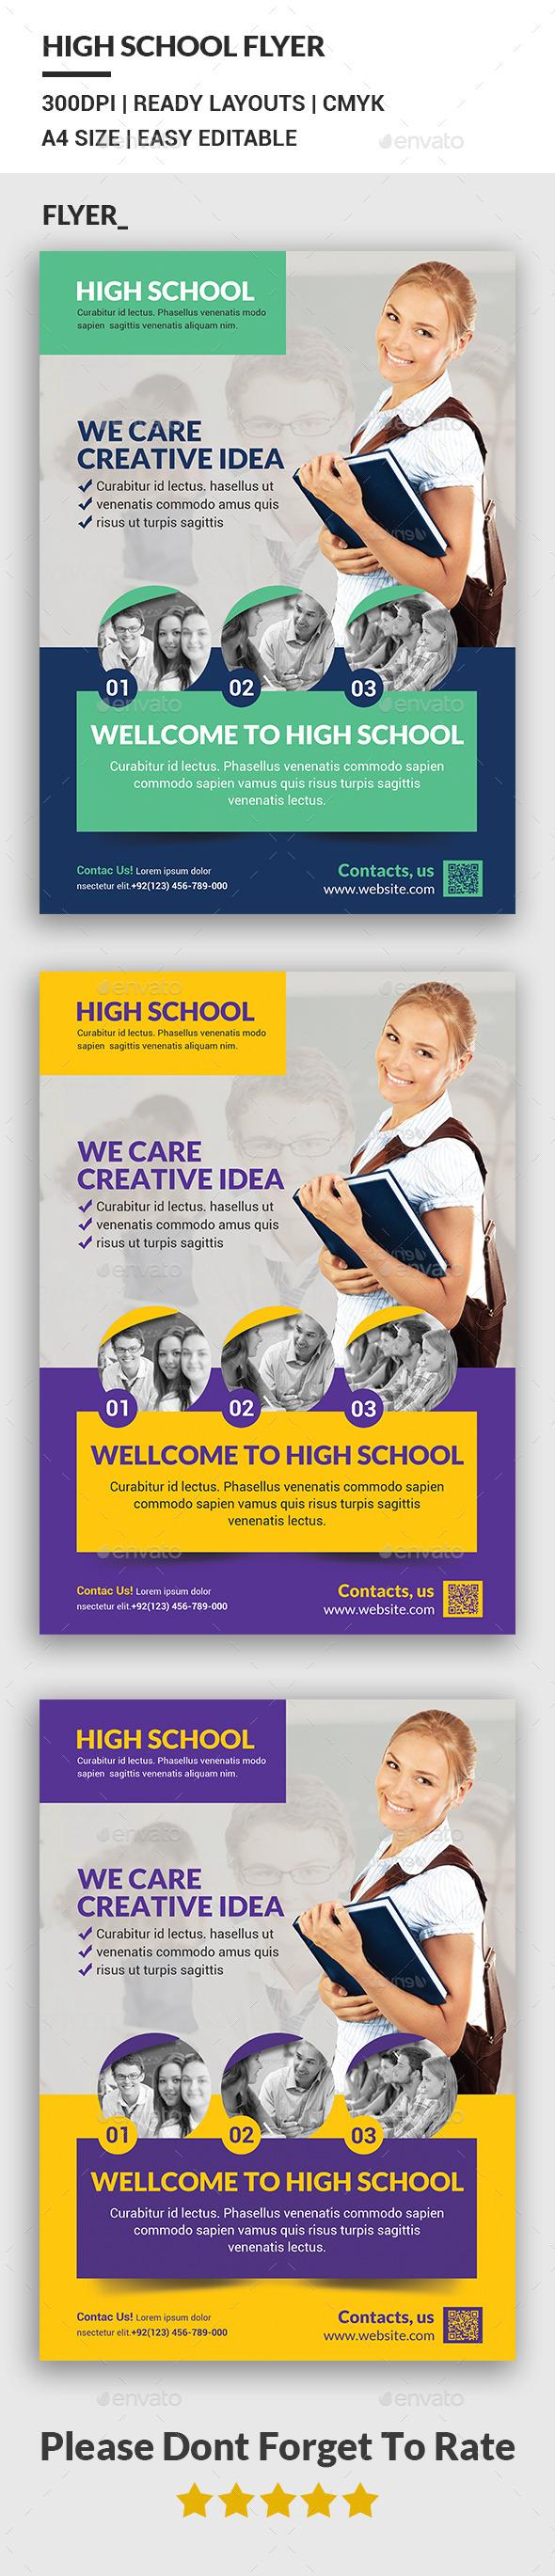 High School Flyer - Corporate Flyers